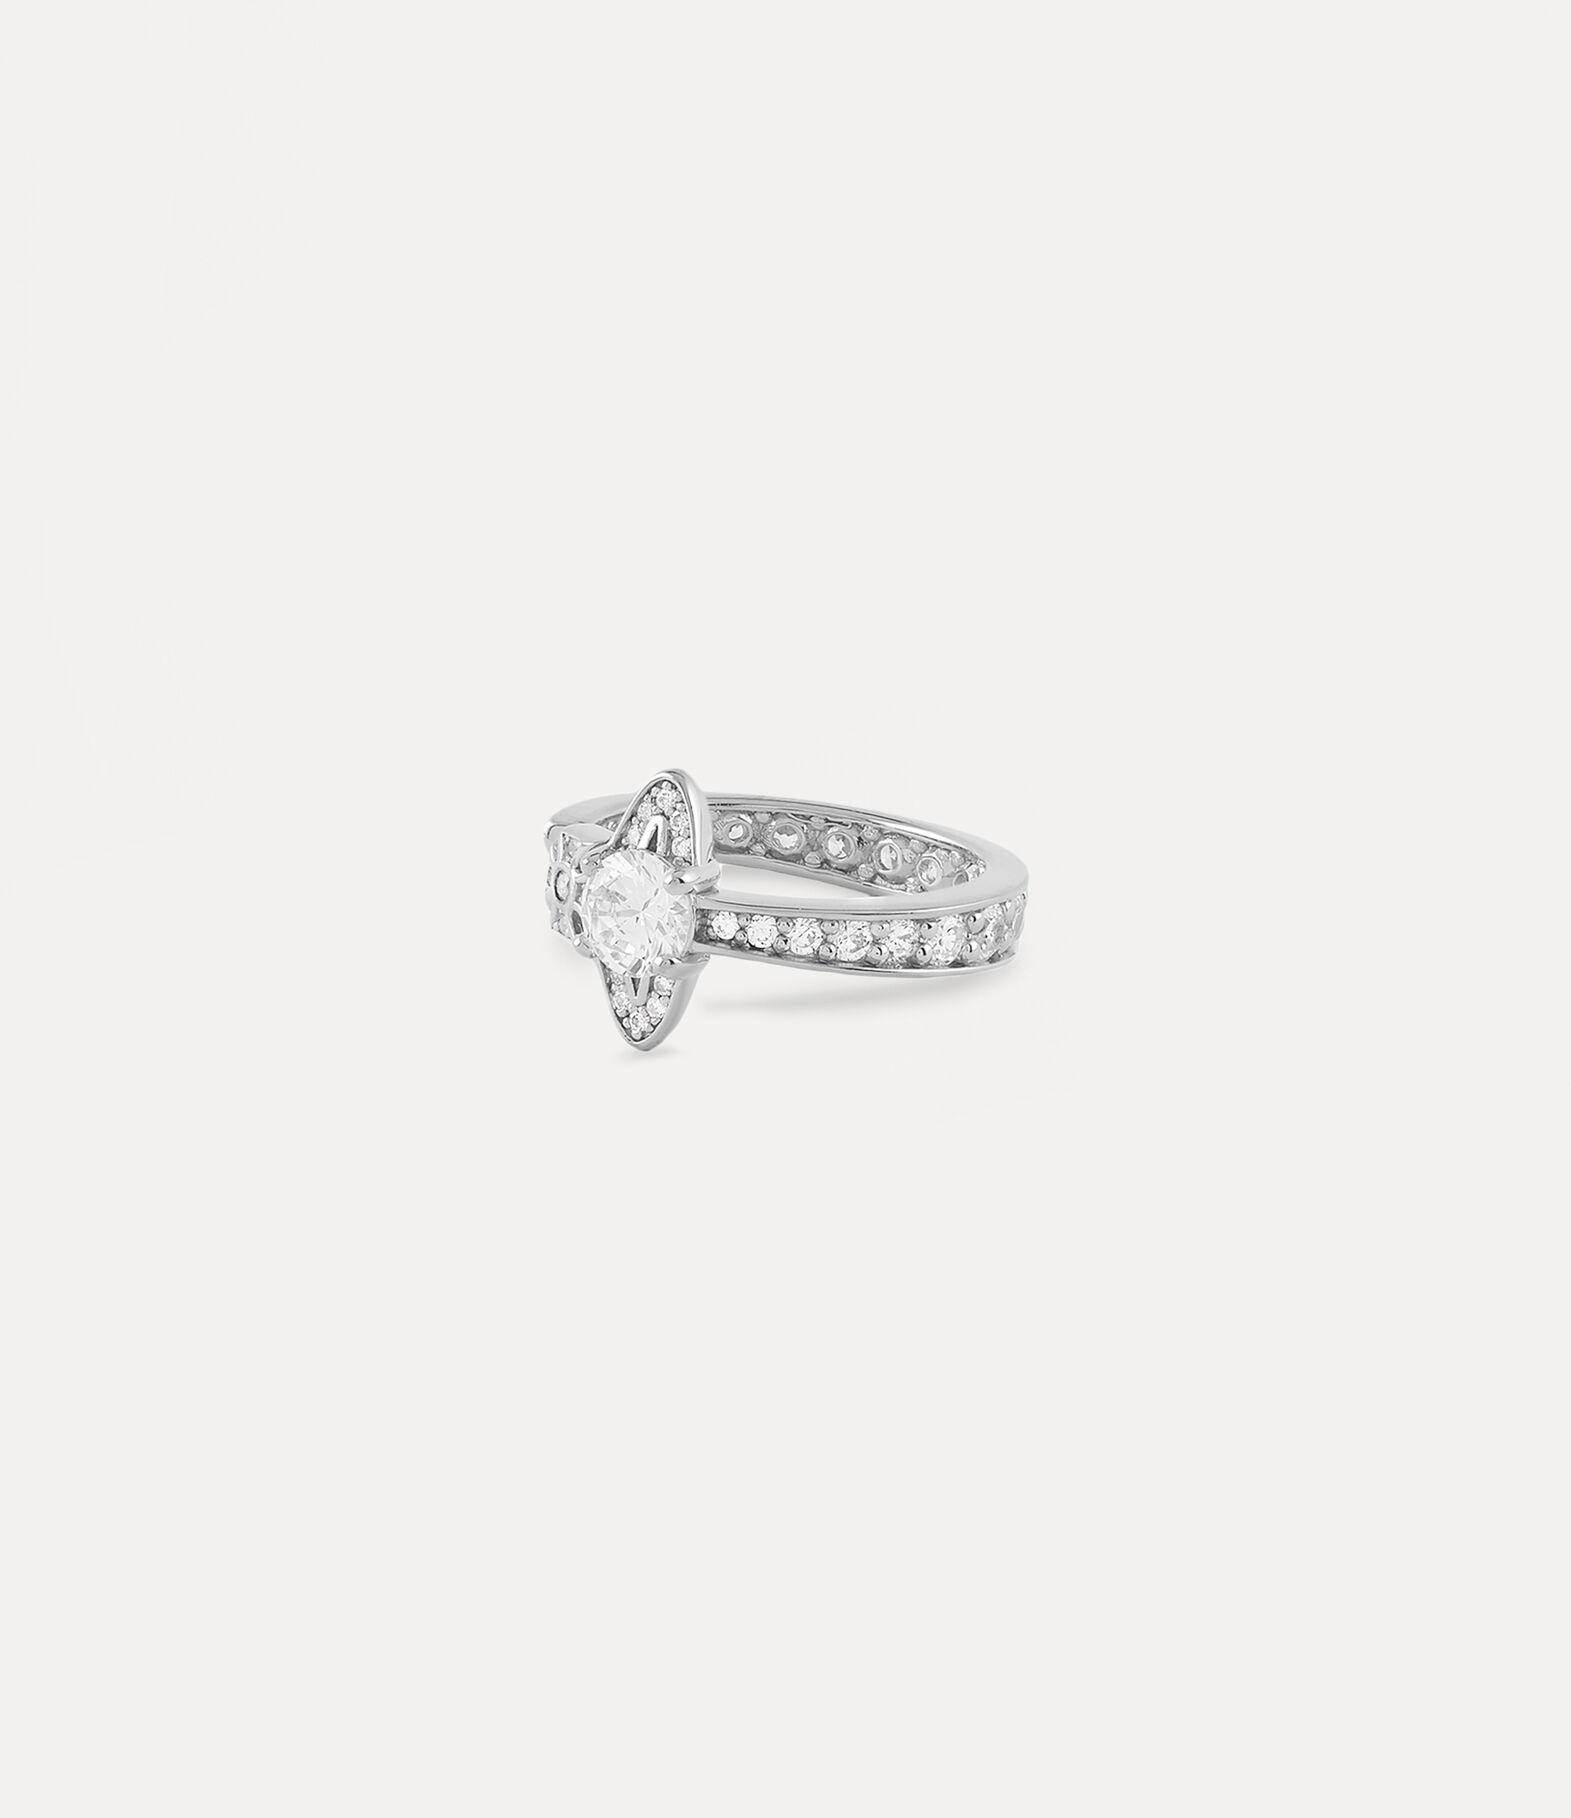 NWT Brand New Contempo Band Ring Size 5678910 Women Jewelry Retired Design Rare Find Brighton Silver plated